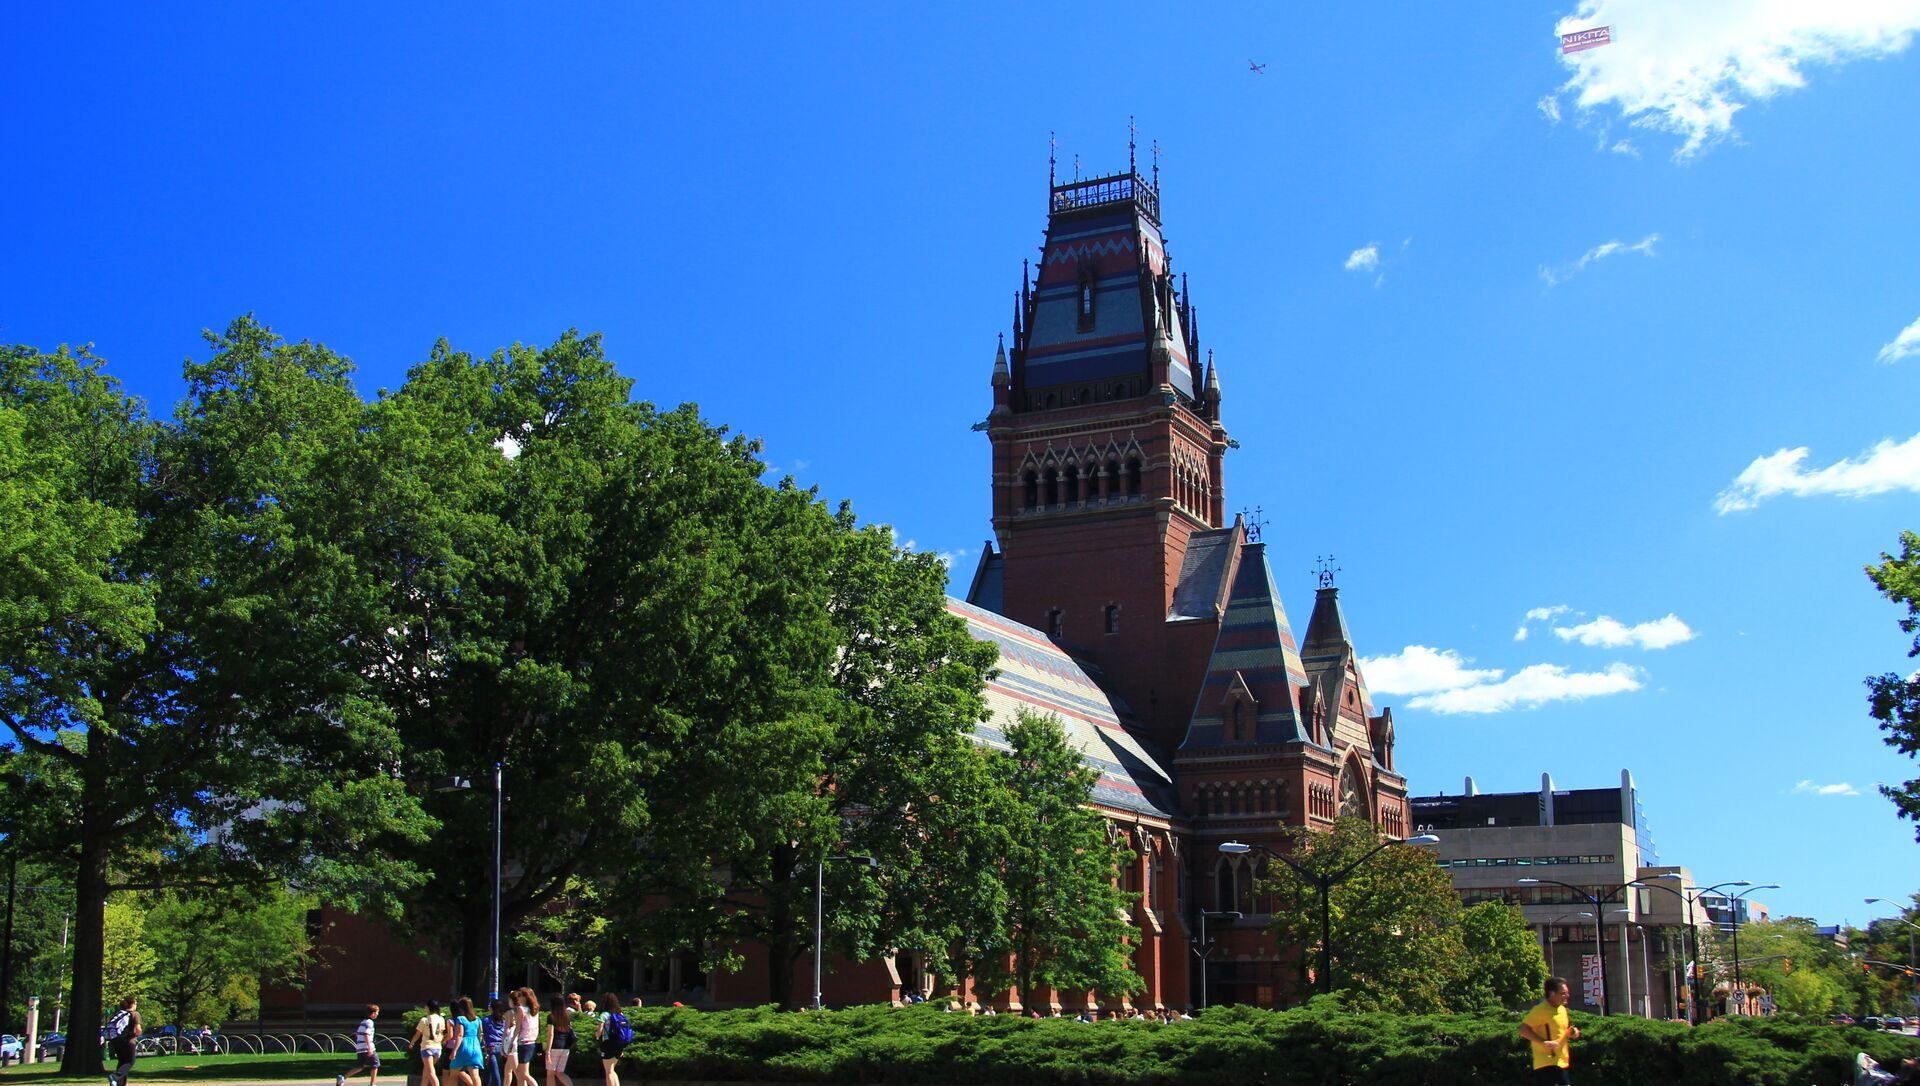 Harvard University - Sputnik International, 1920, 31.07.2021